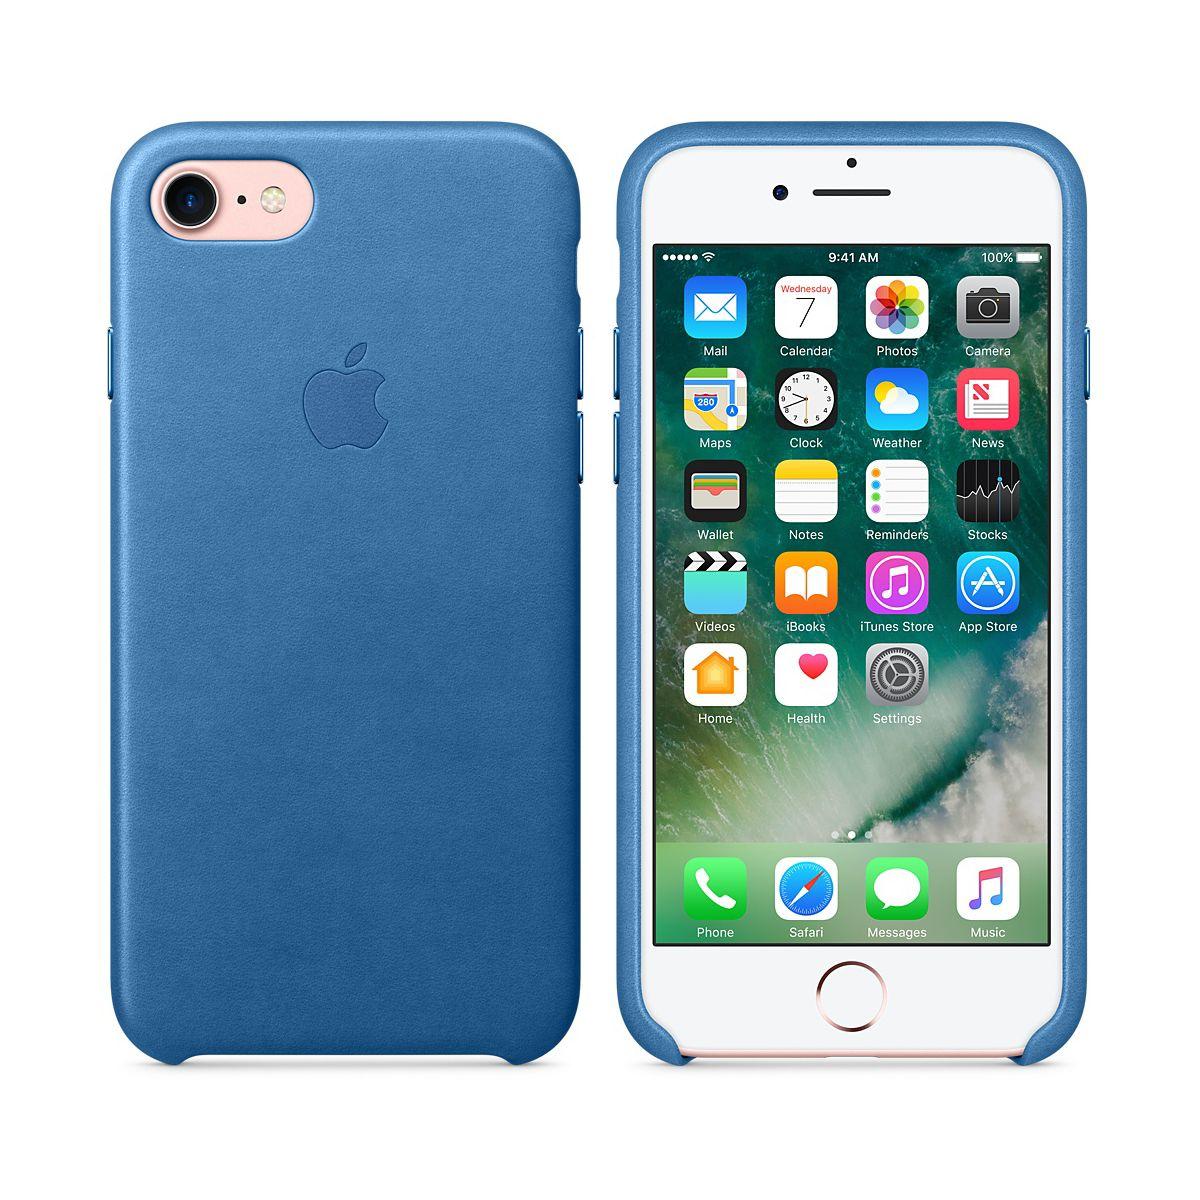 Coque APPLE iPhone 7 Bleu Méditerranée cuir (photo)